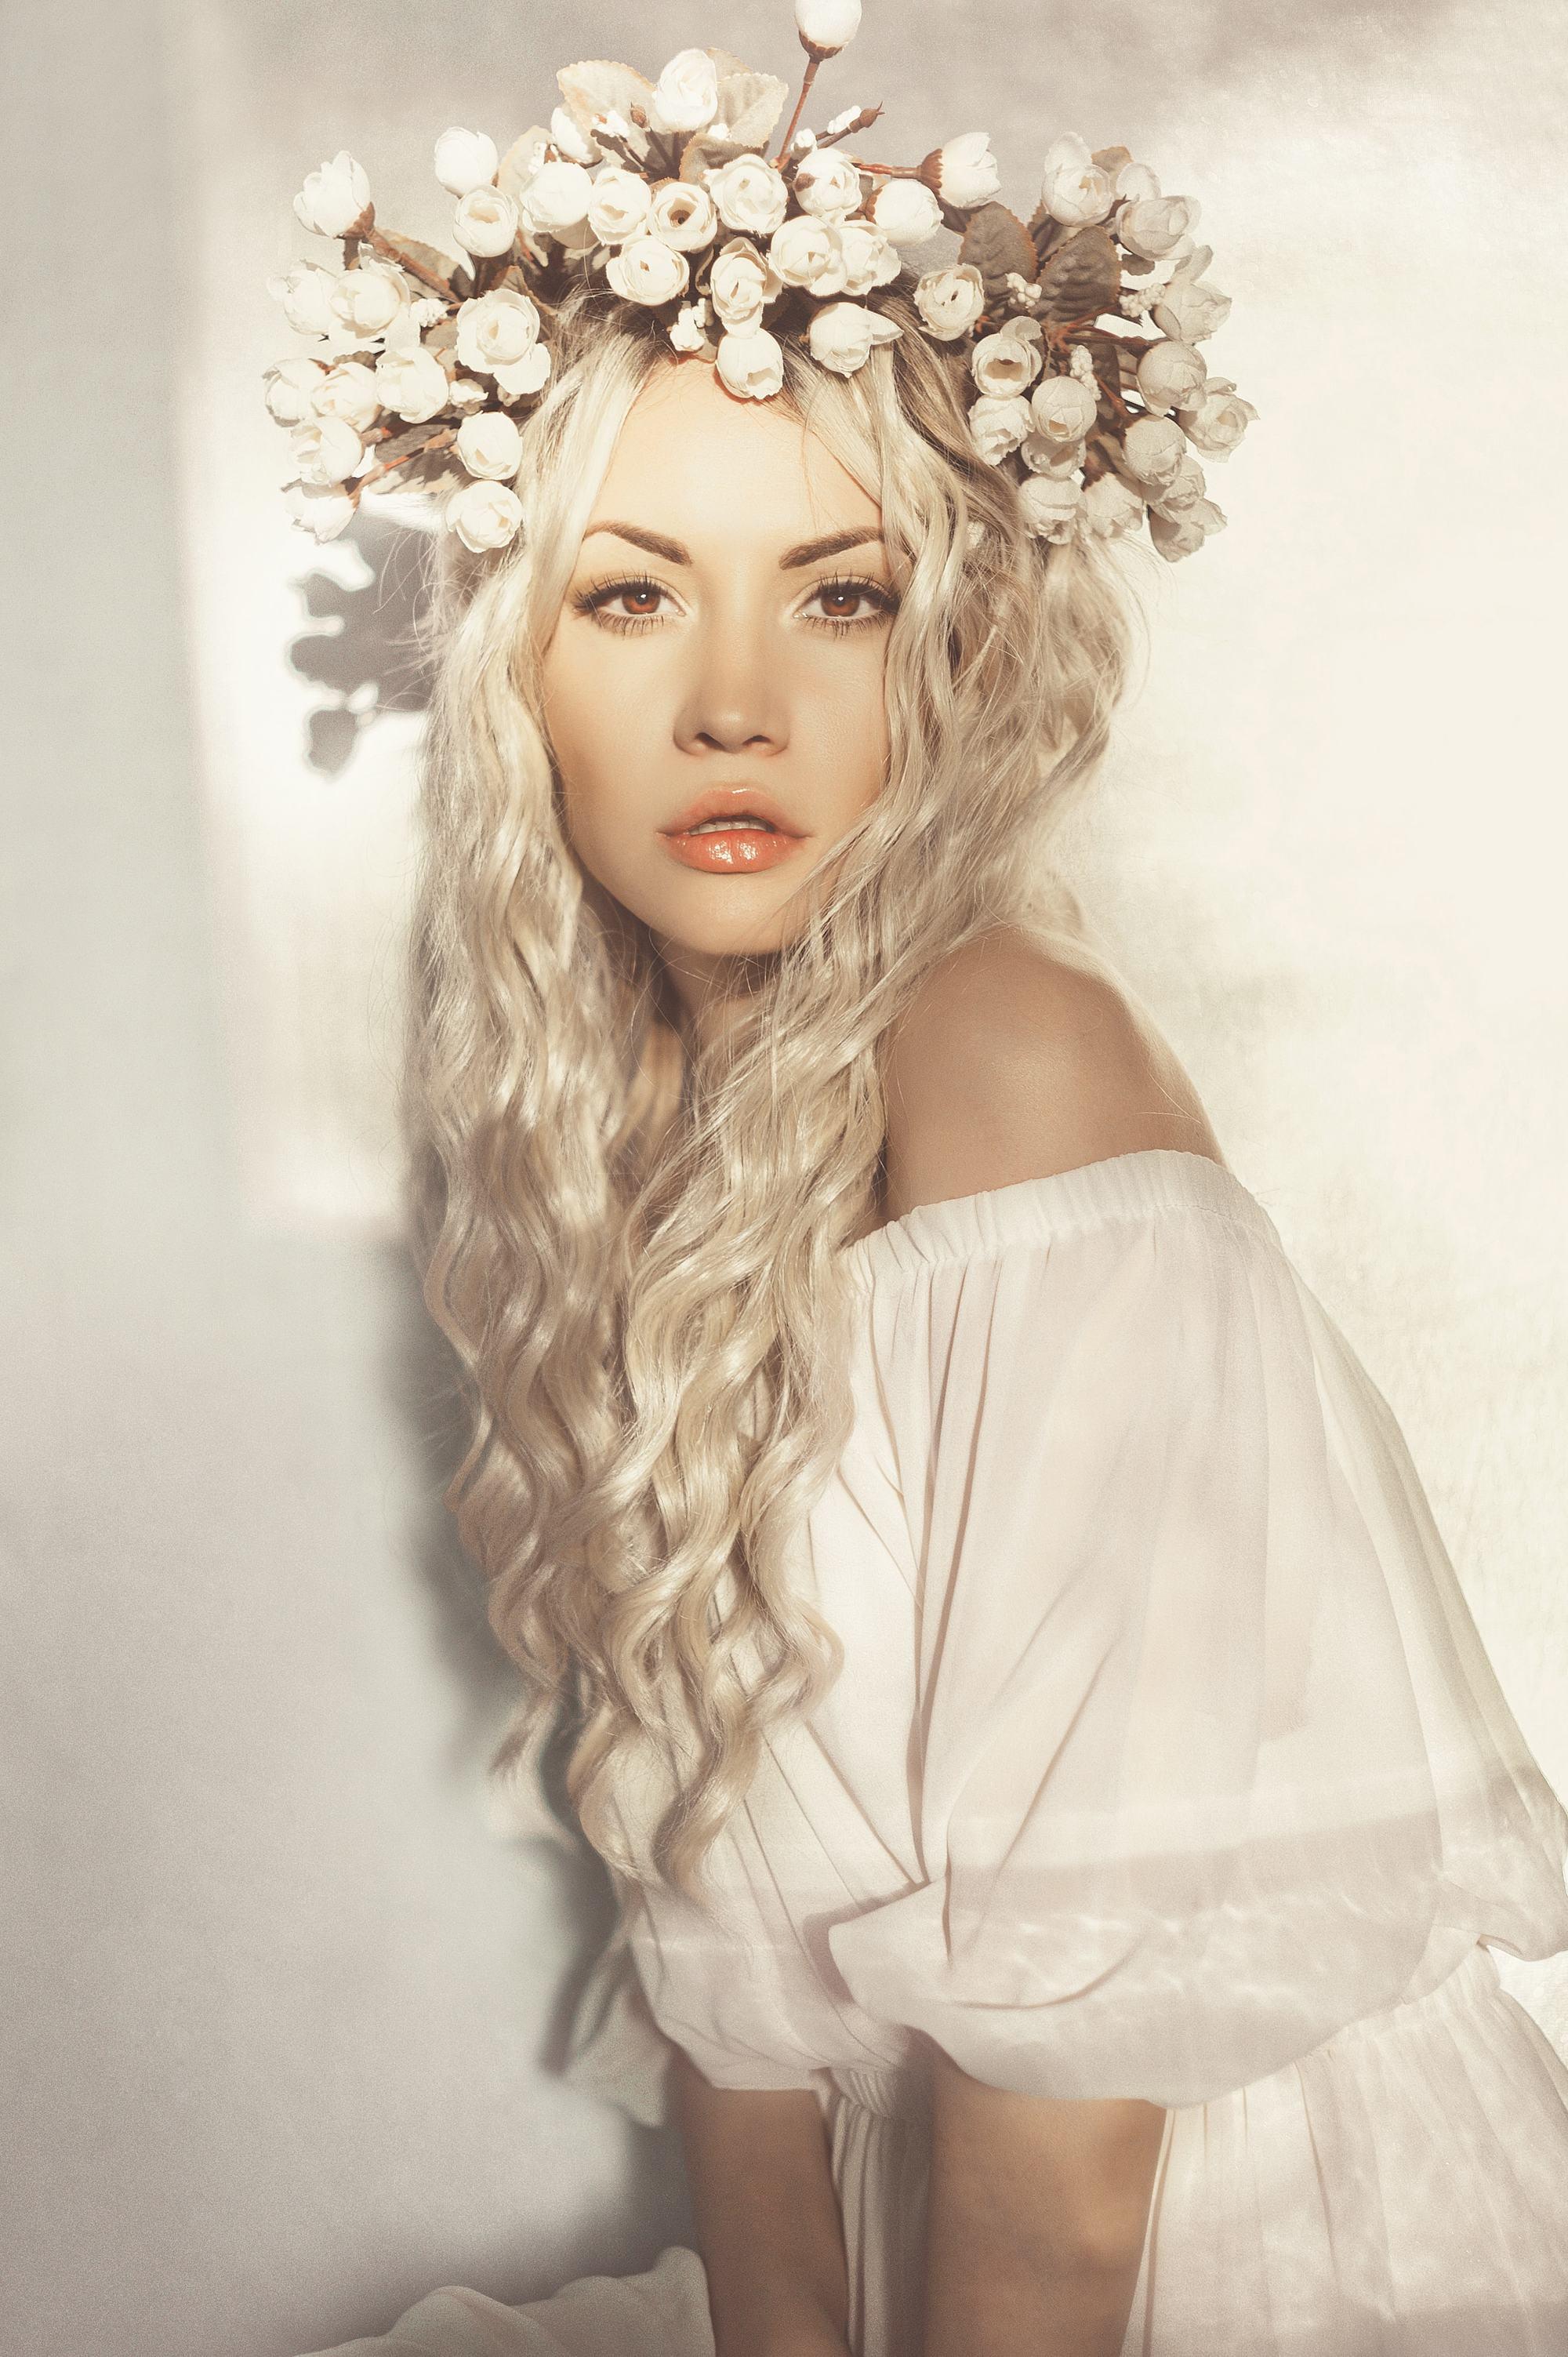 Elegant Bridal Hairstyles For Modern, Chic Looks Elegant Bridal Hairstyles For Modern, Chic Looks new foto